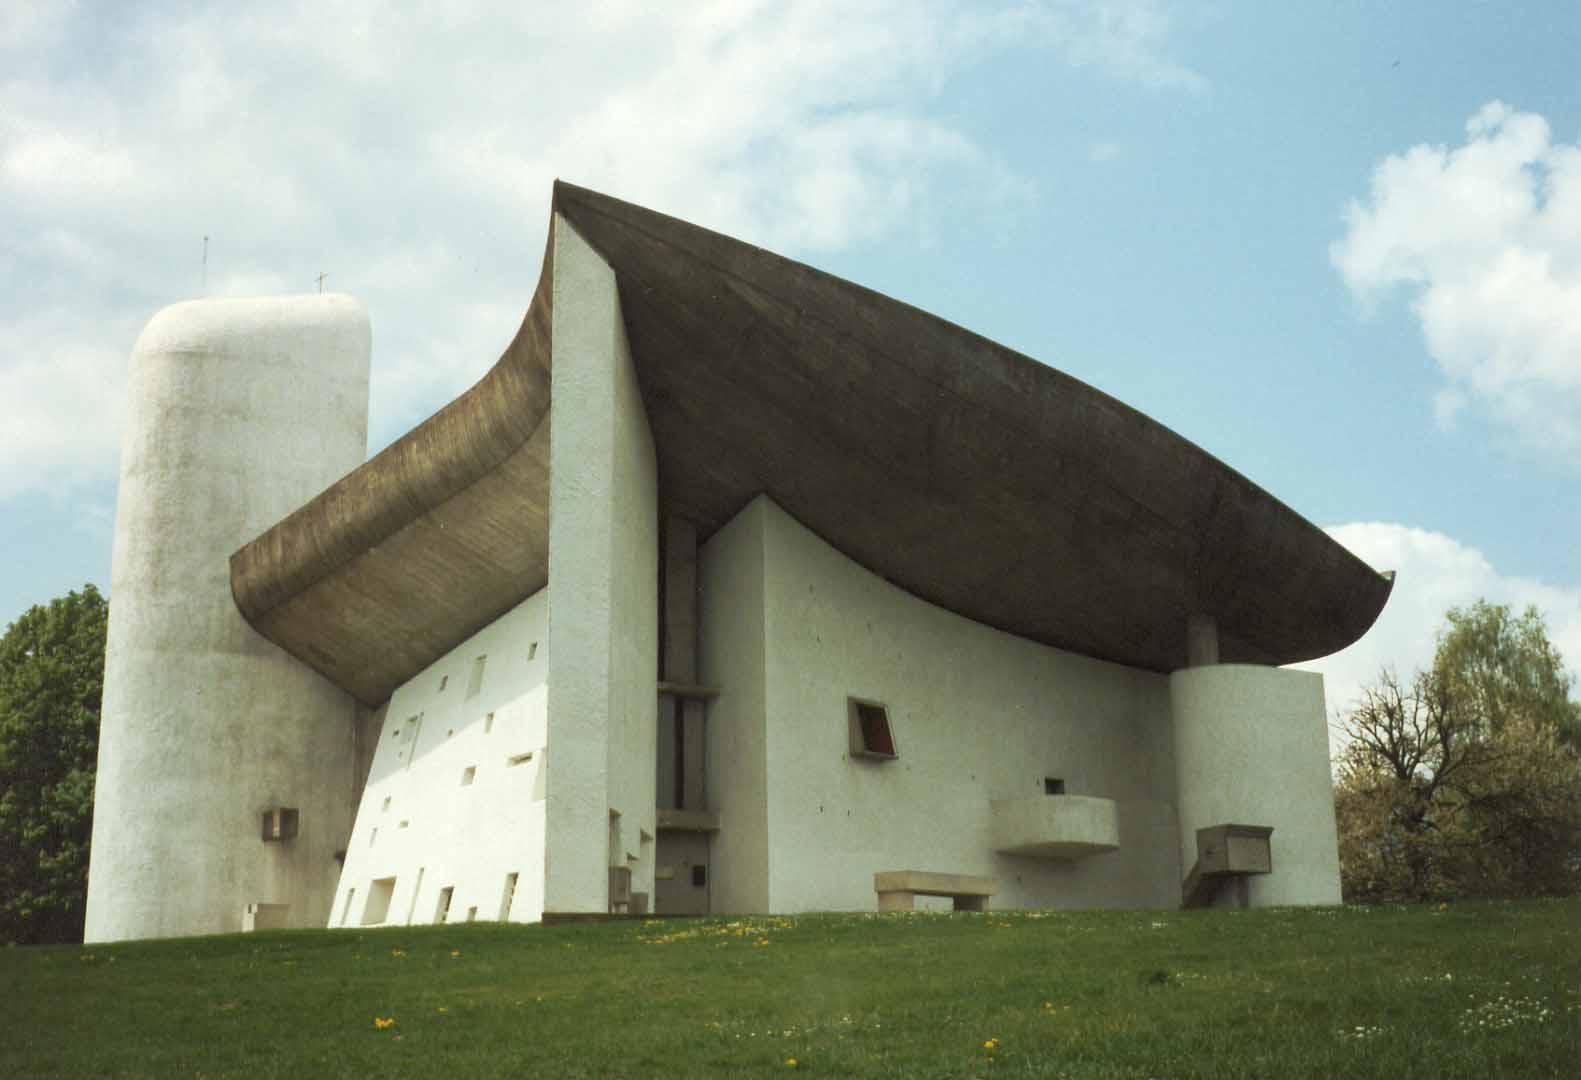 Bad blog about design architect of the week le corbusier - Le corbusier design ...